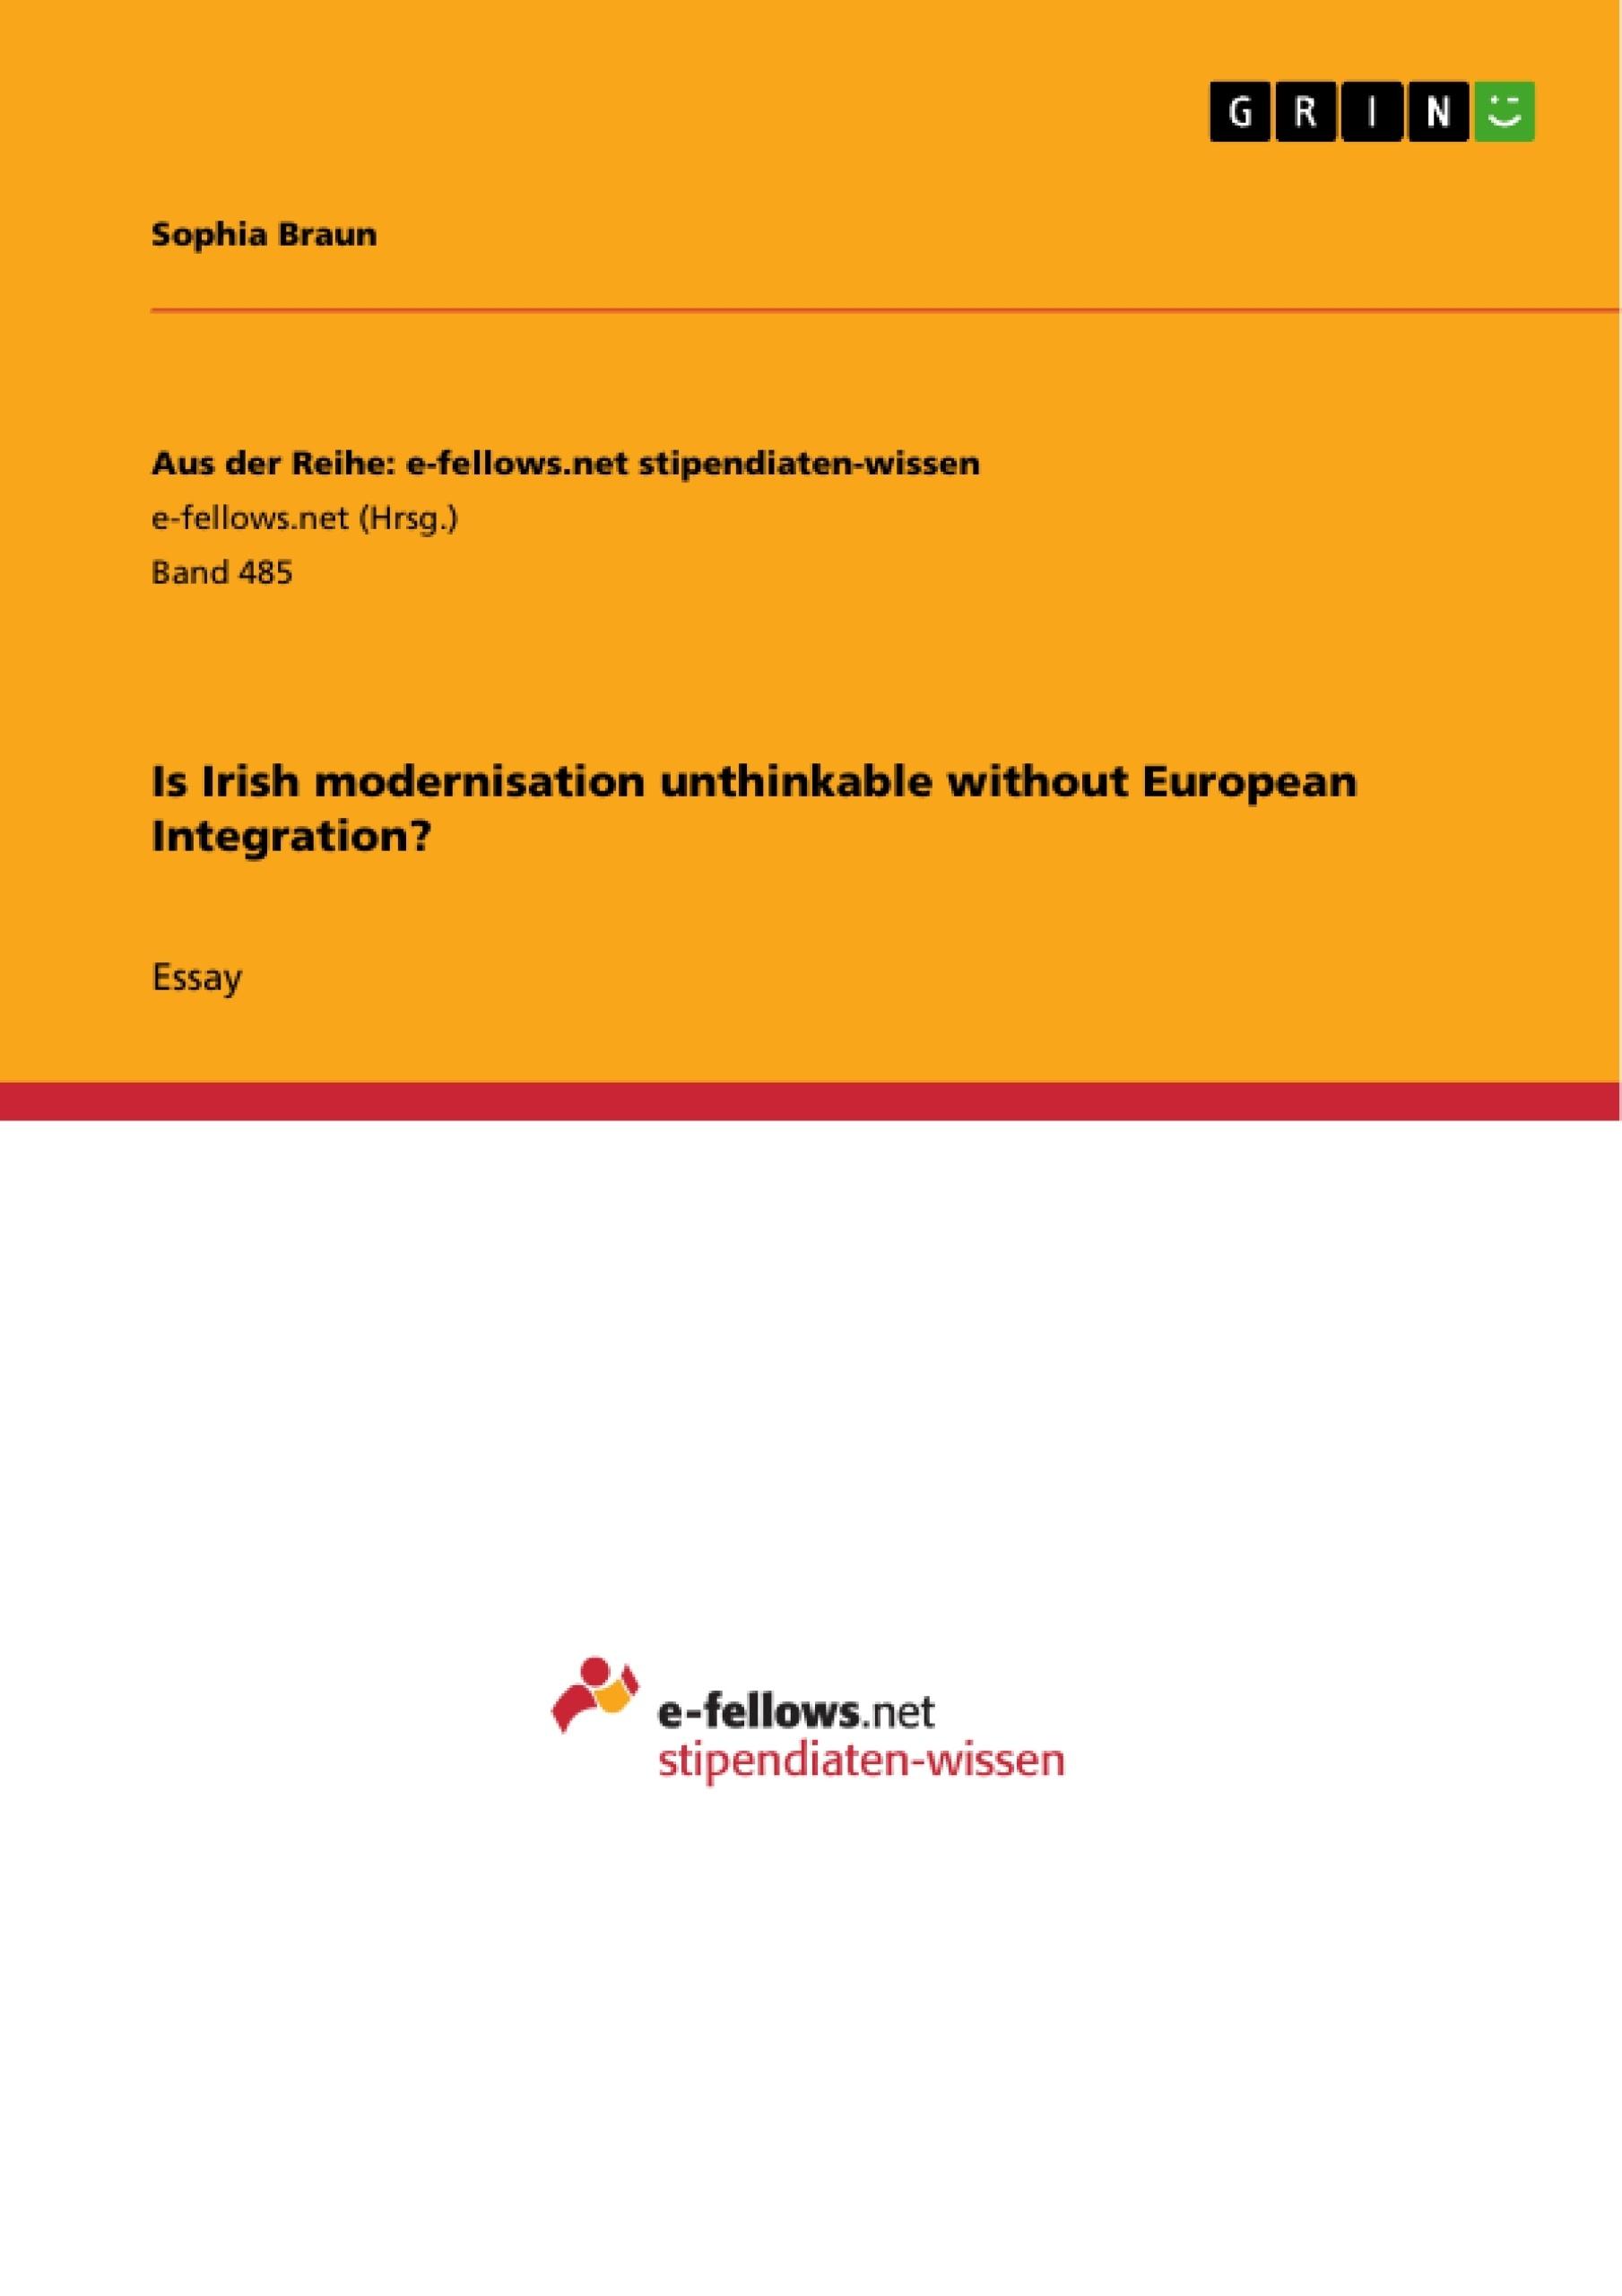 Title: Is Irish modernisation unthinkable without European Integration?